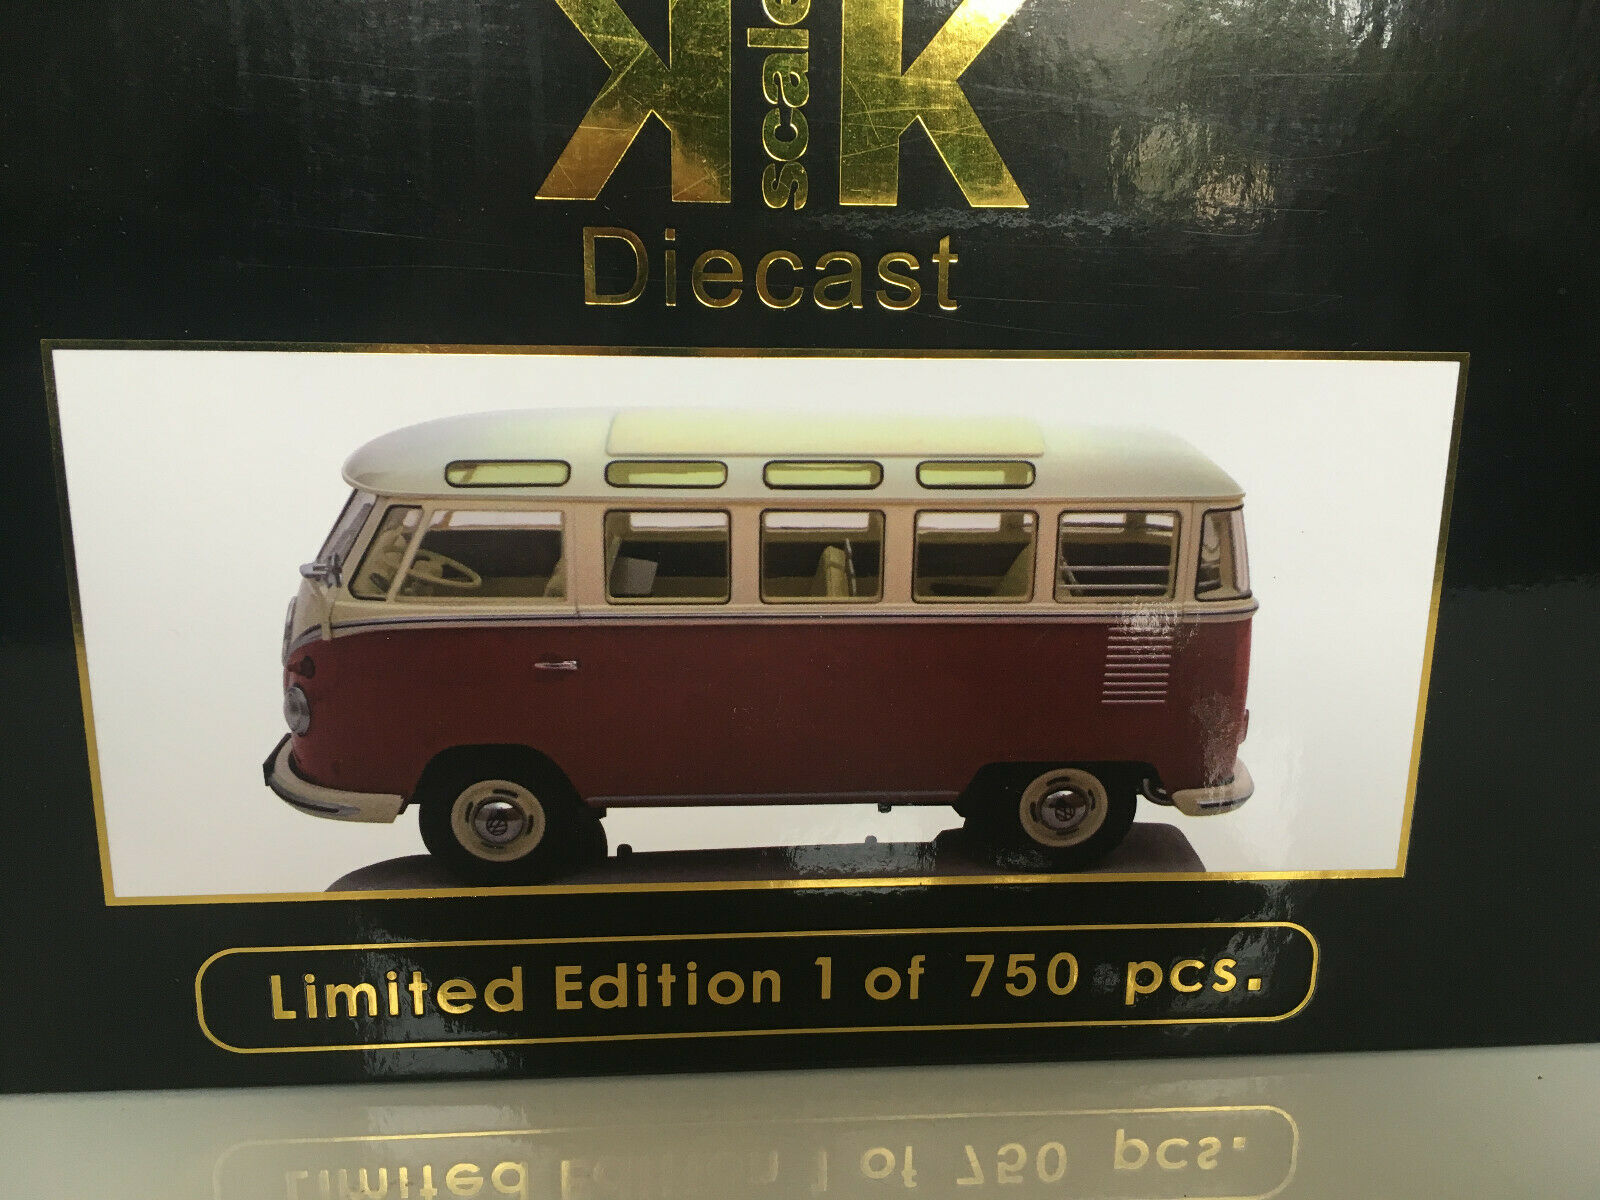 1962 furgoneta VW t1 samba - 1 18-kk - Scale